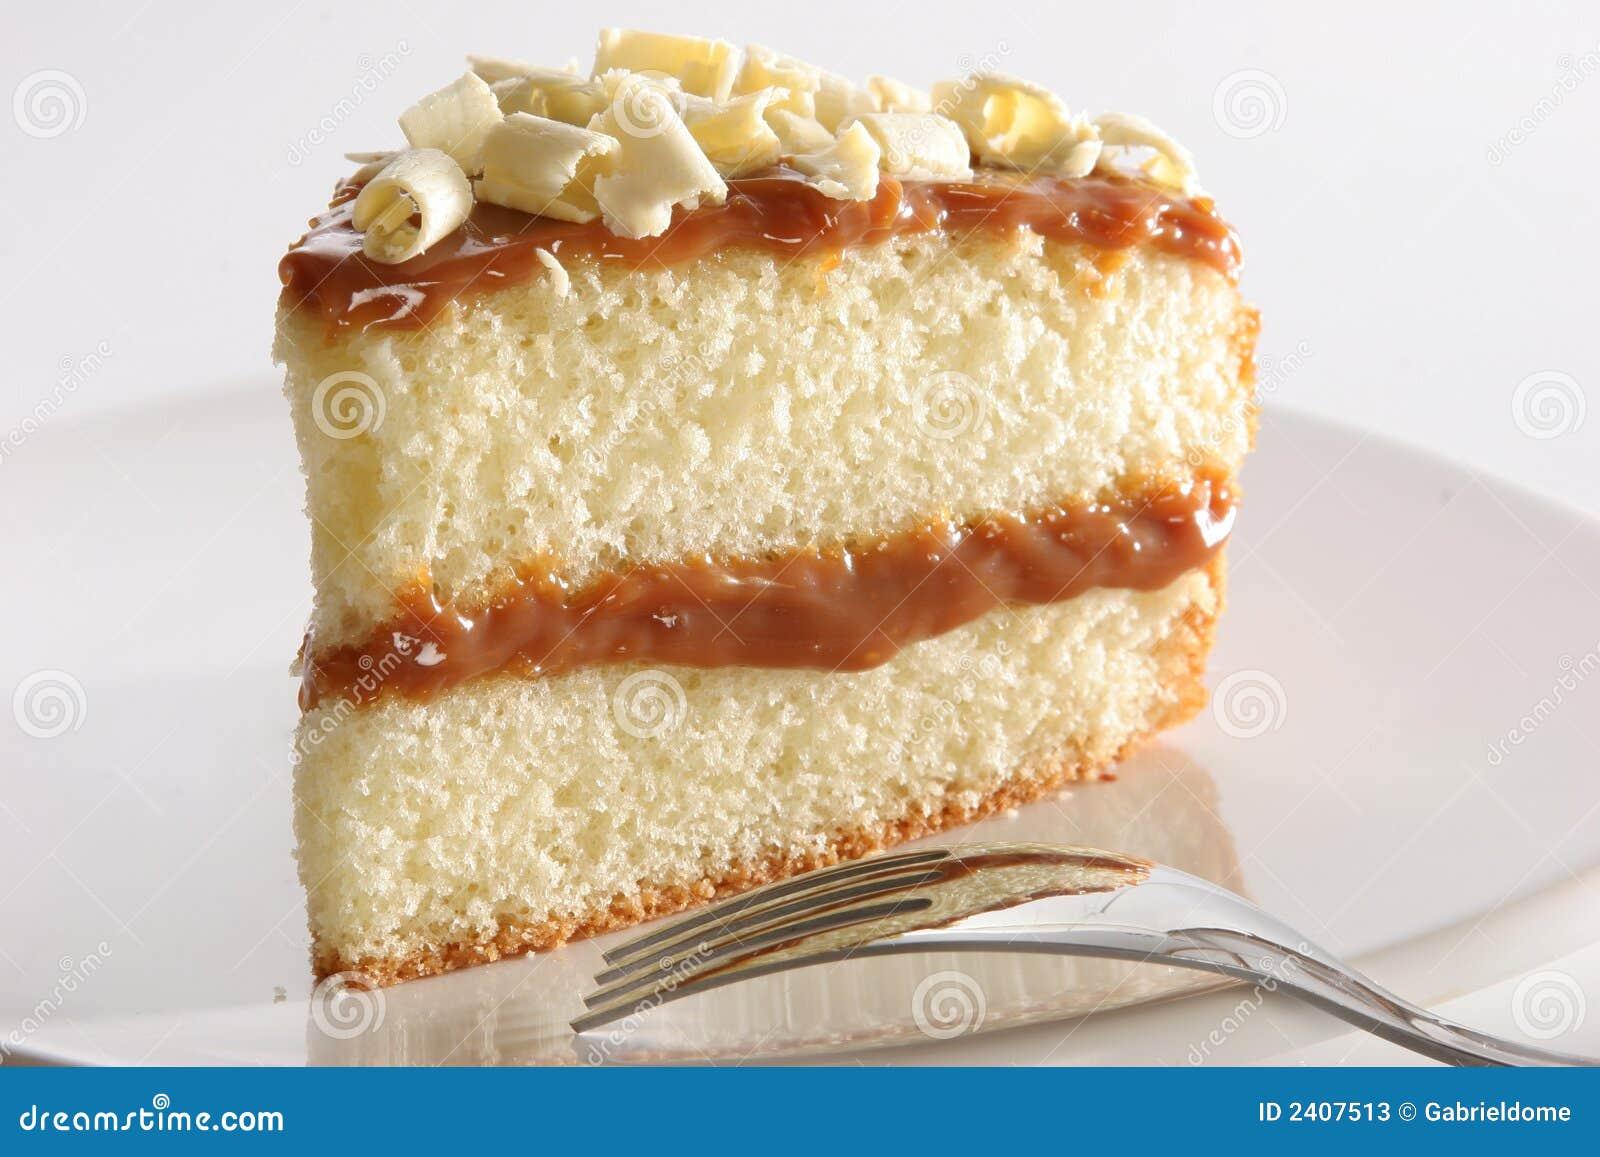 Many Layered Cake